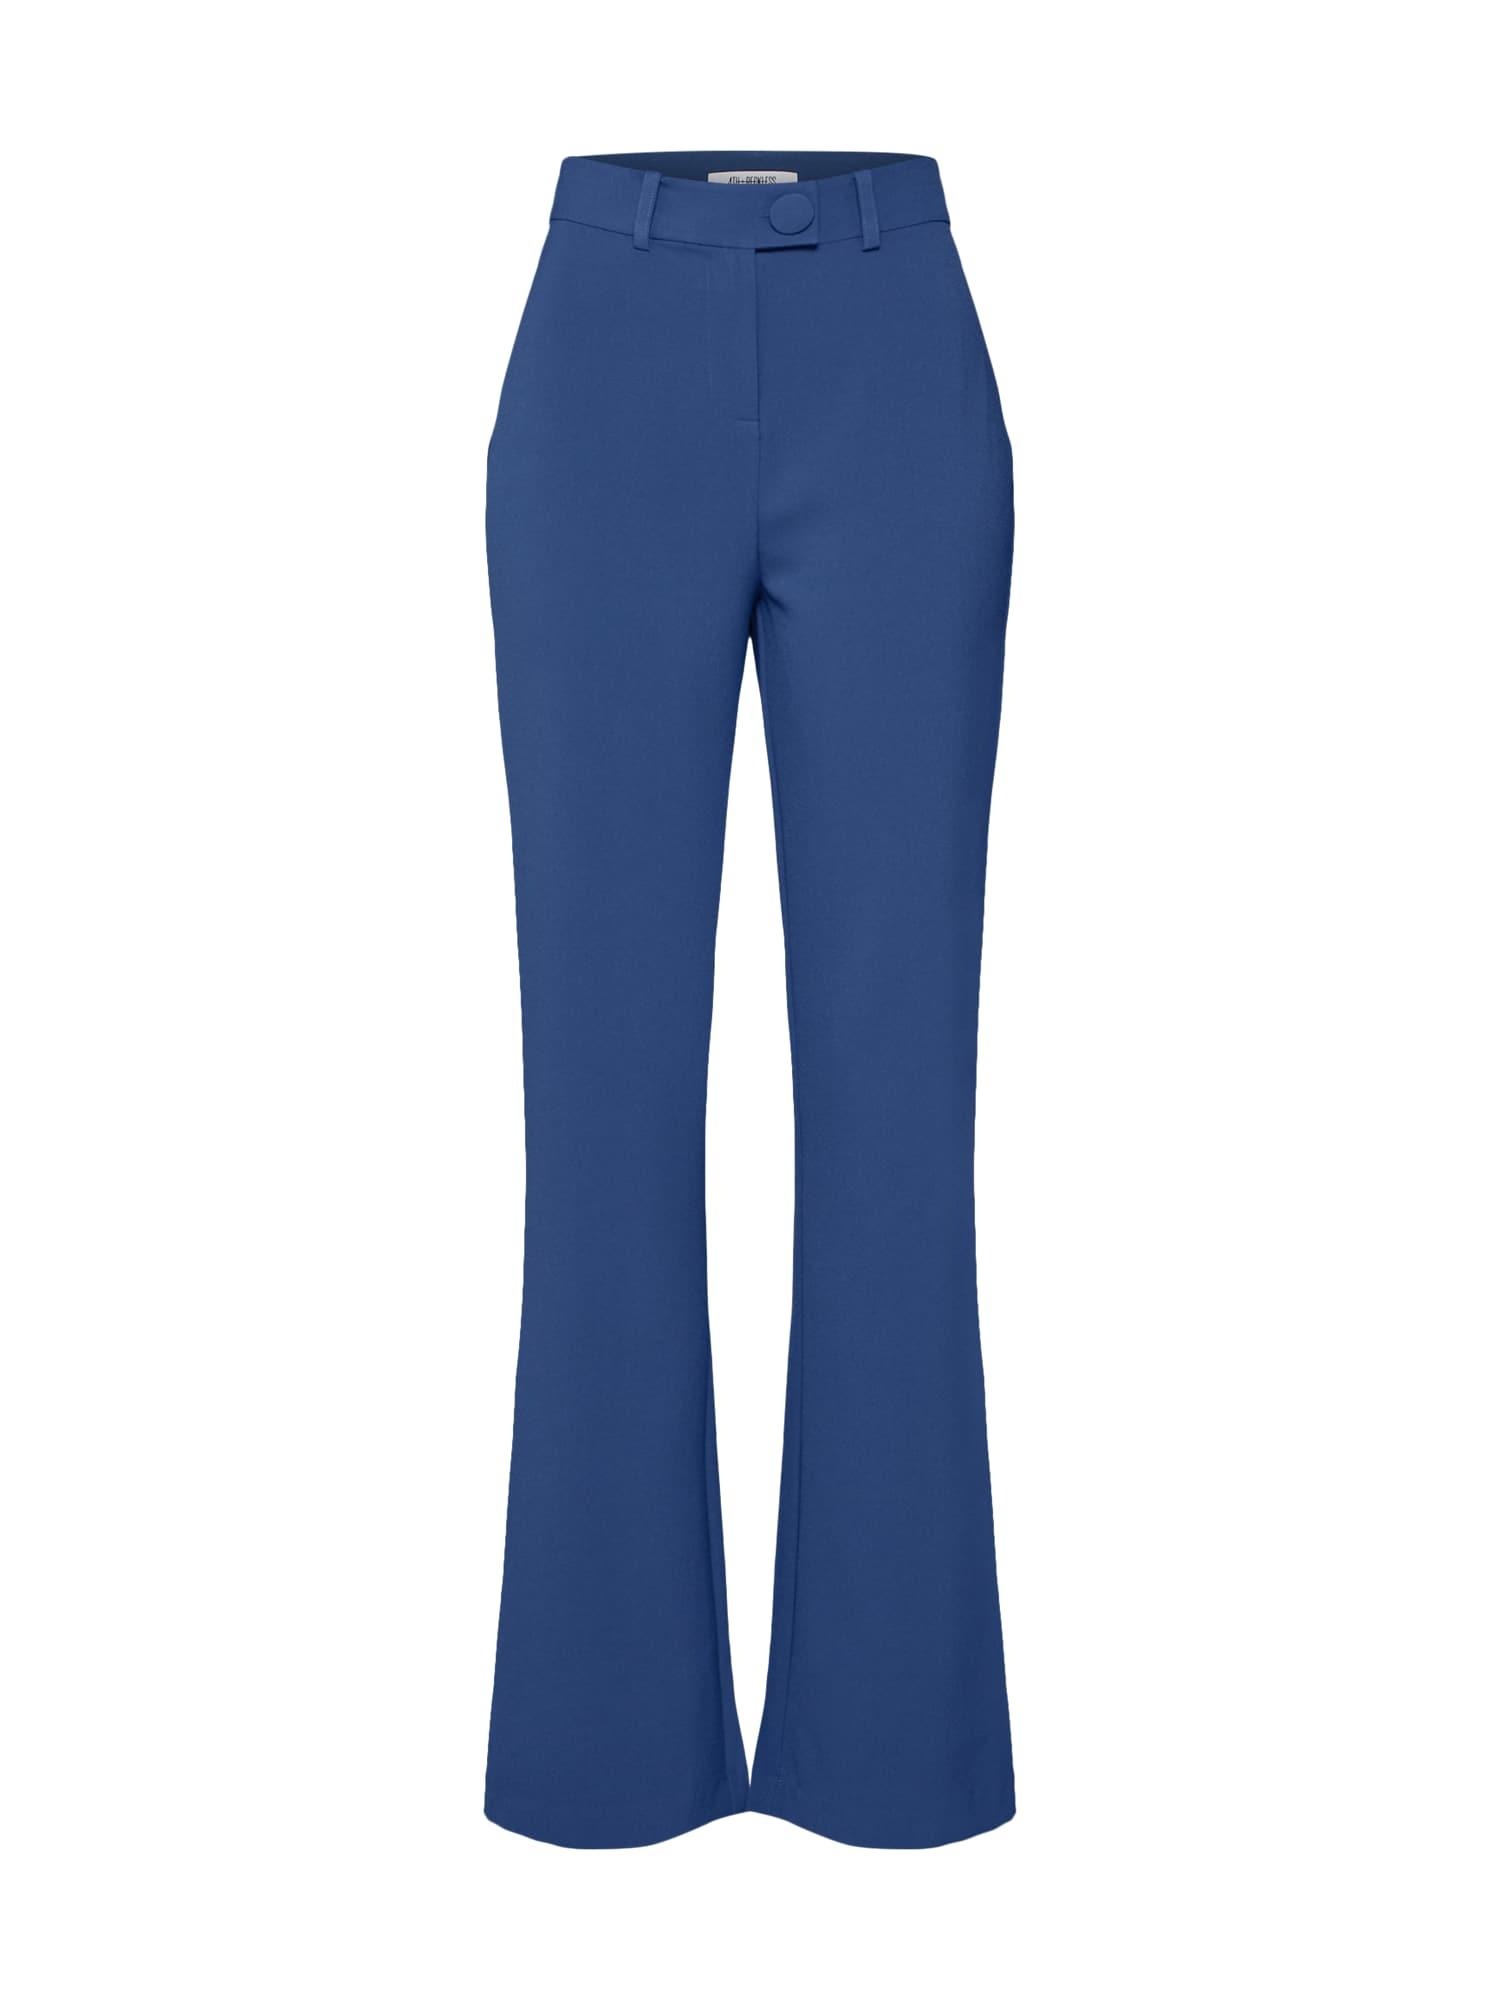 Kalhoty BAILEY modrá 4th & Reckless